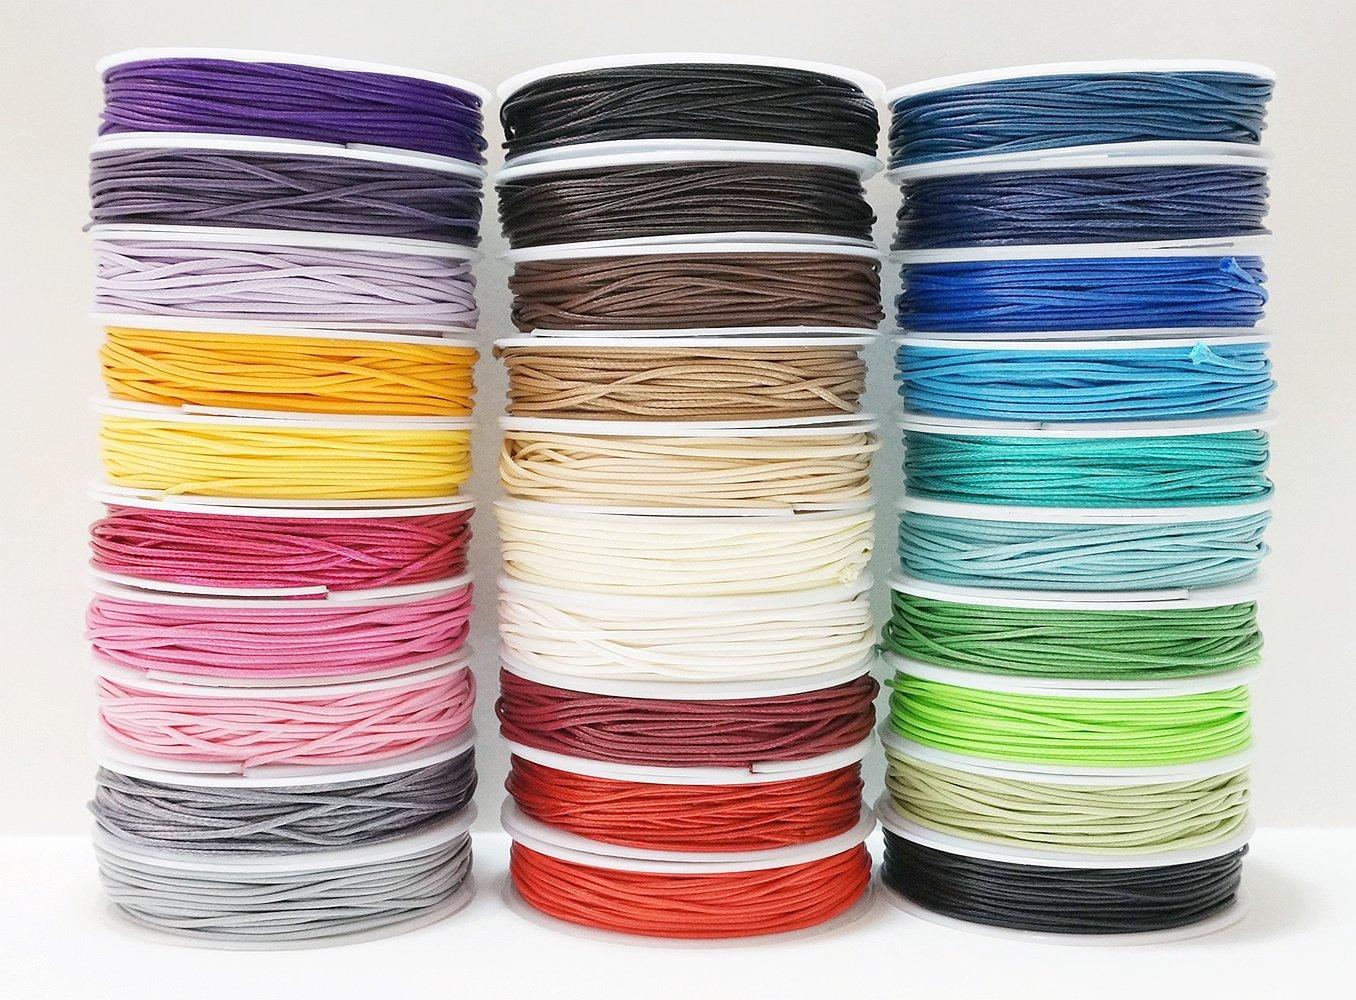 1mm Faux Imitation Leather Polyester Braided Cord Macrame Bracelet Artisan String (10 X 10yards Spool)